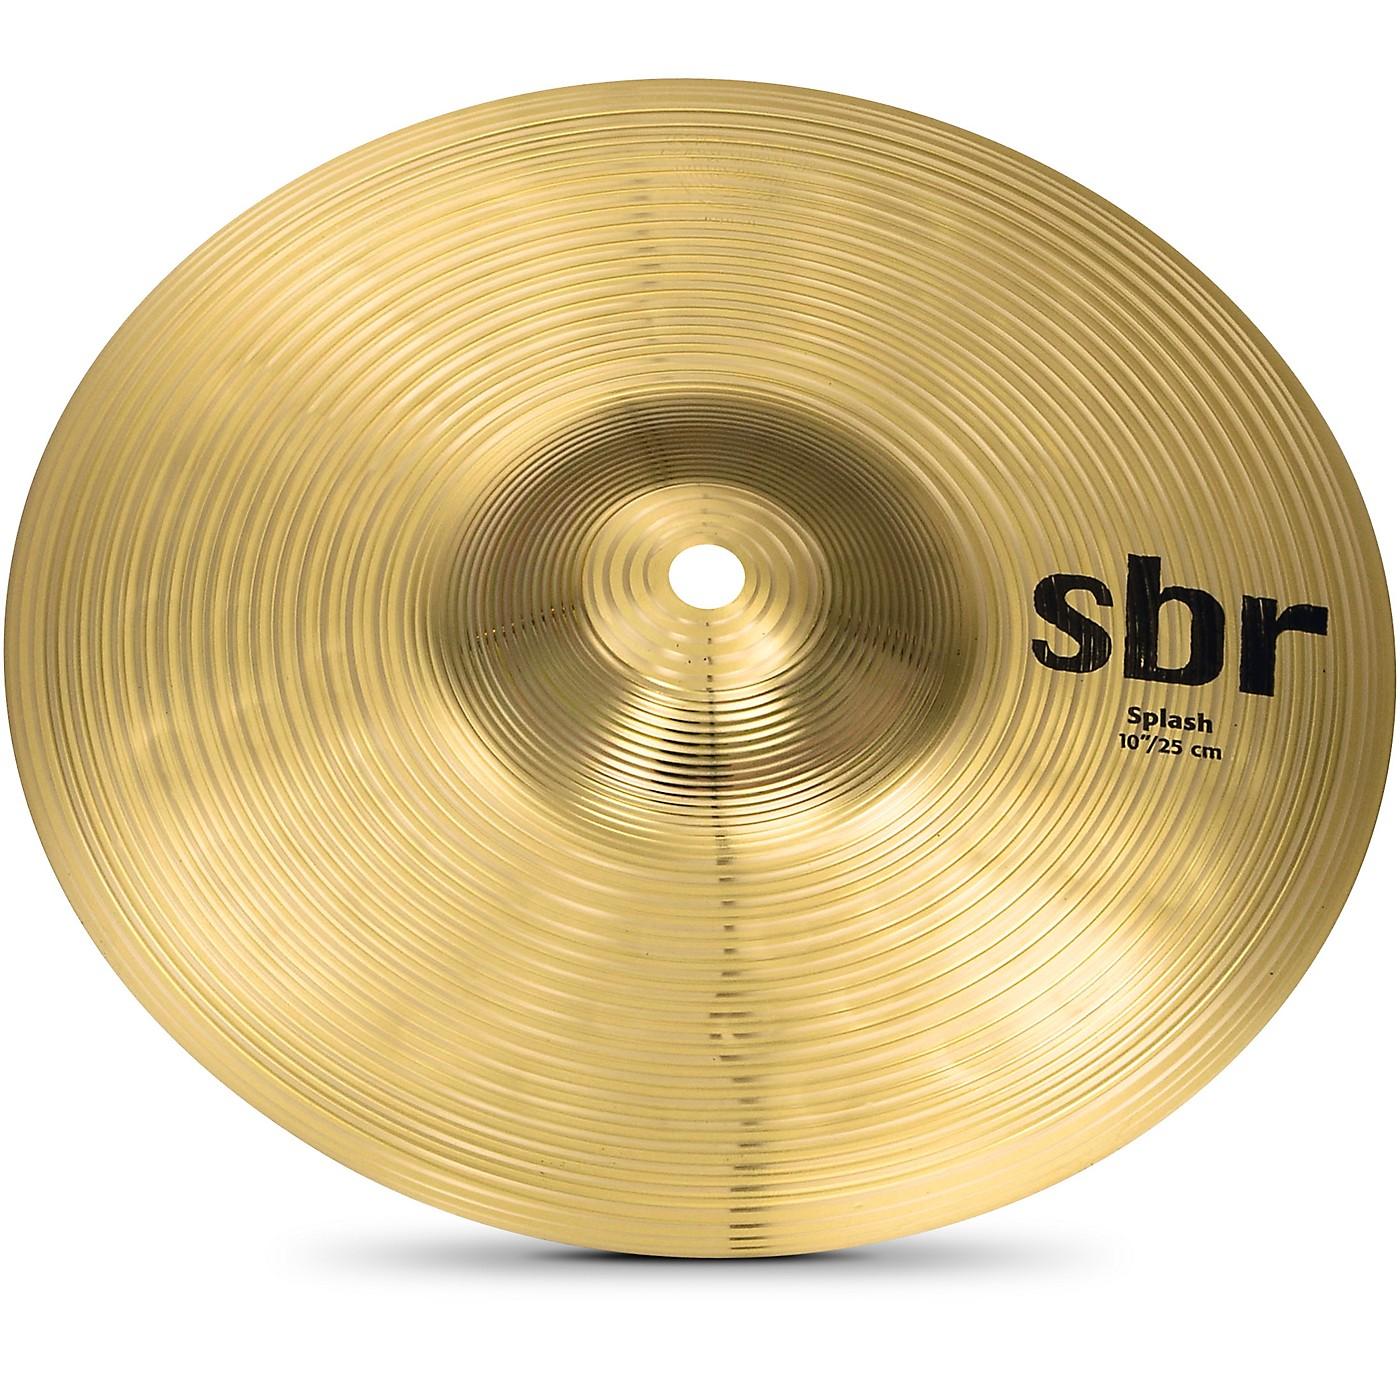 Sabian SBR SPLASH Cymbal thumbnail